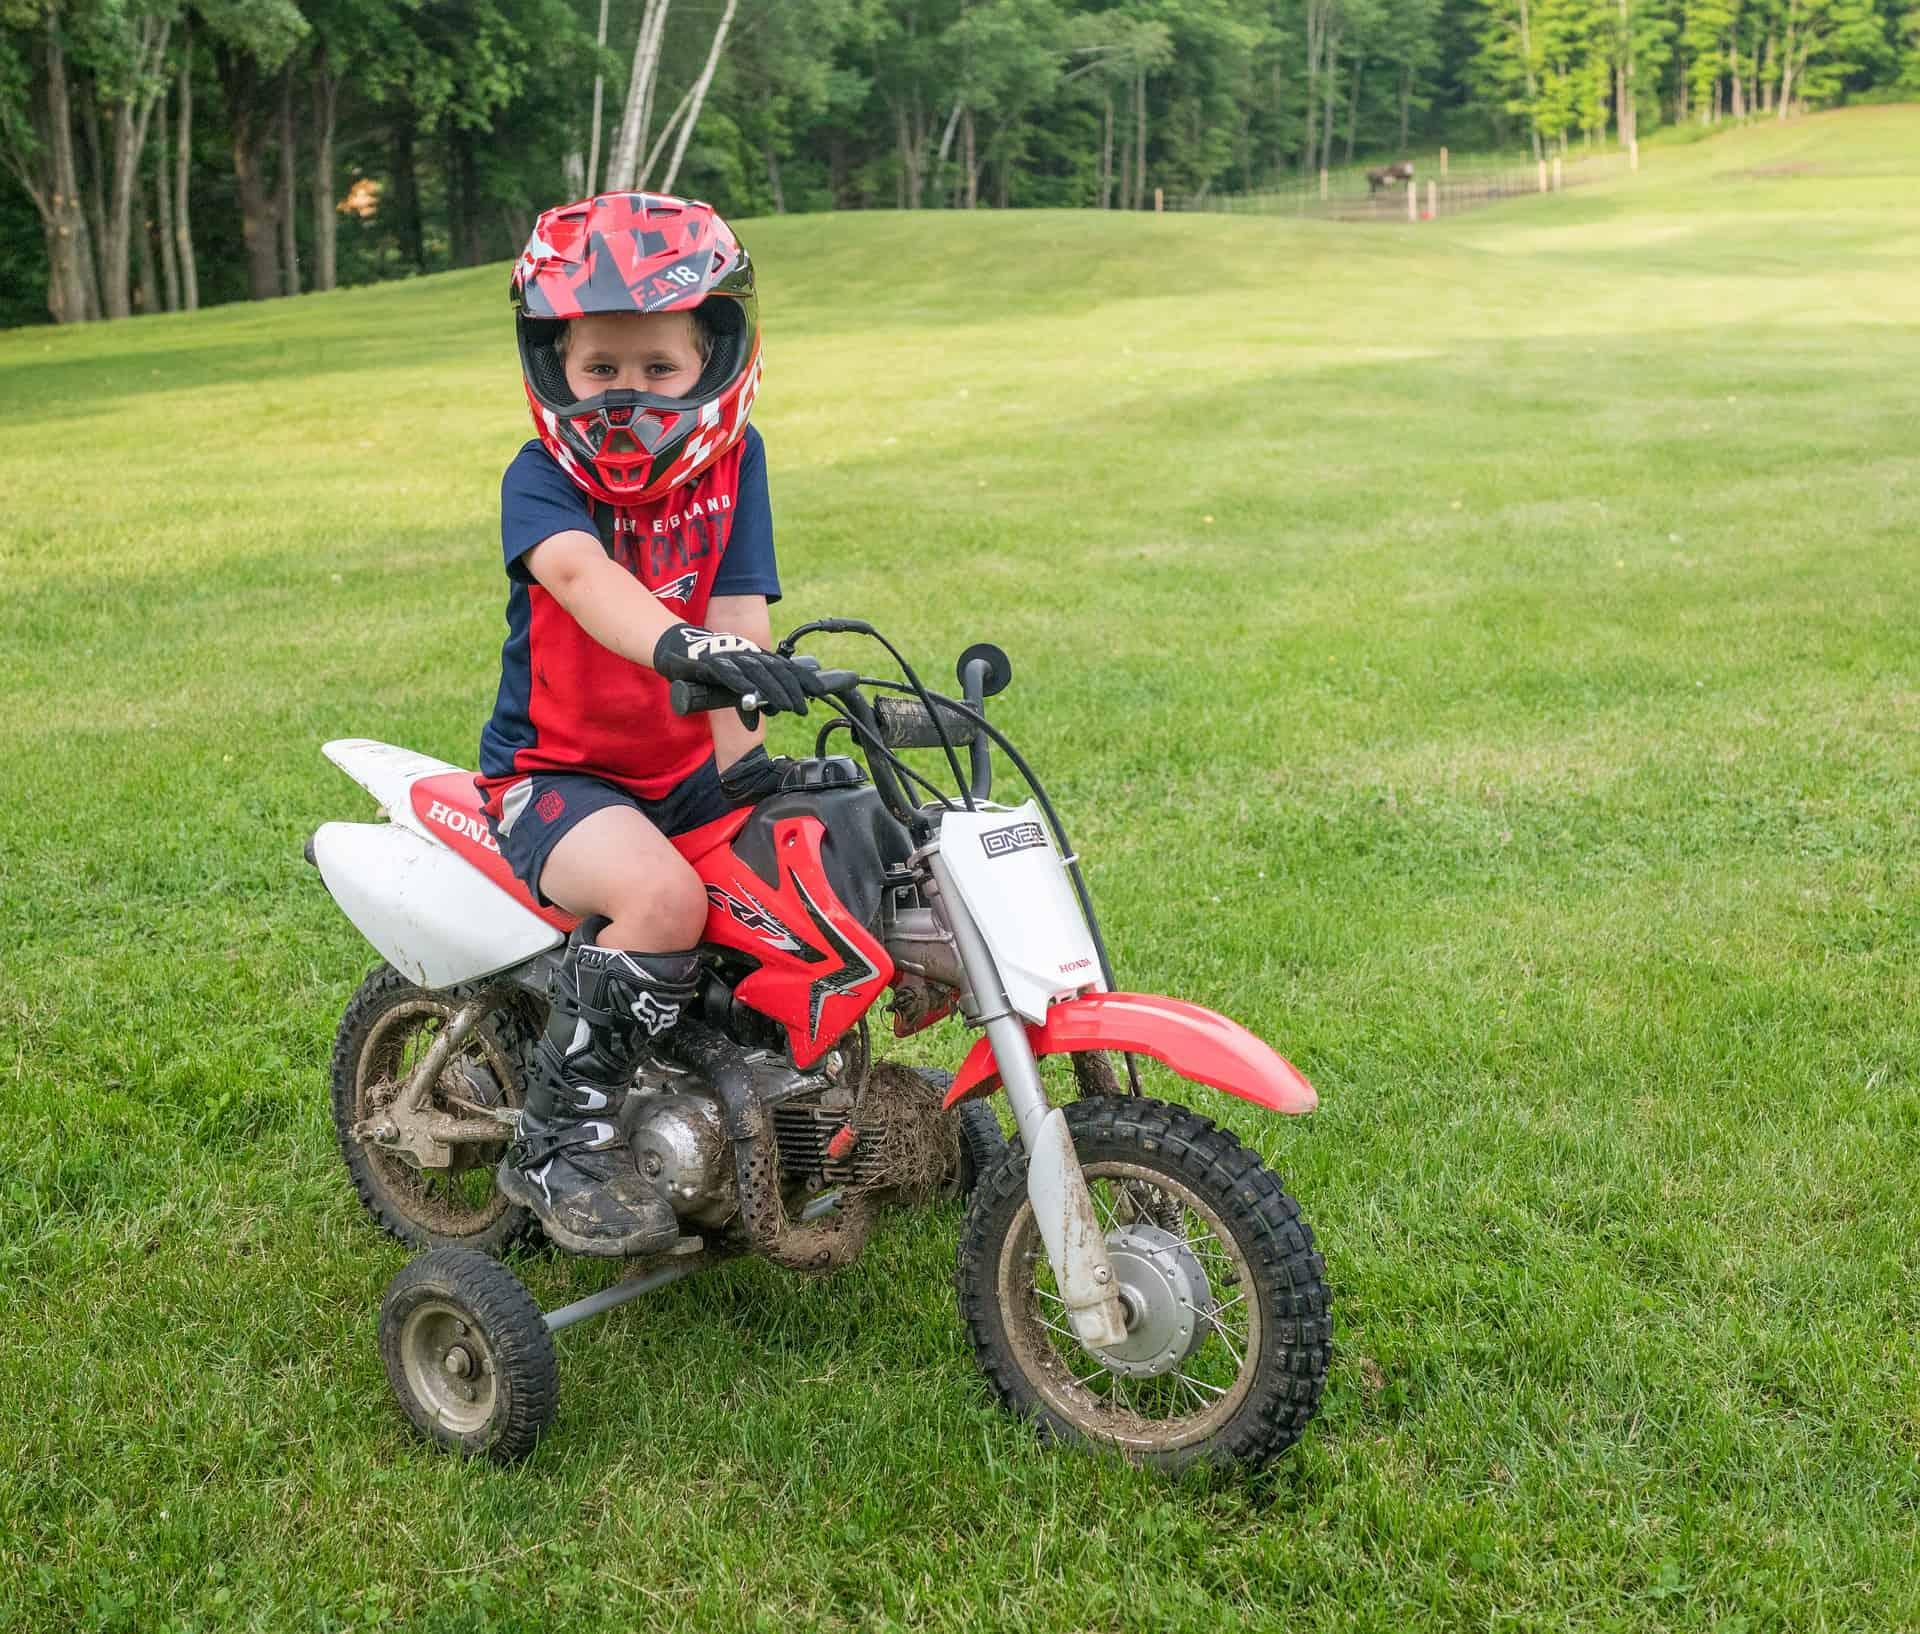 smiling boy dirt bike